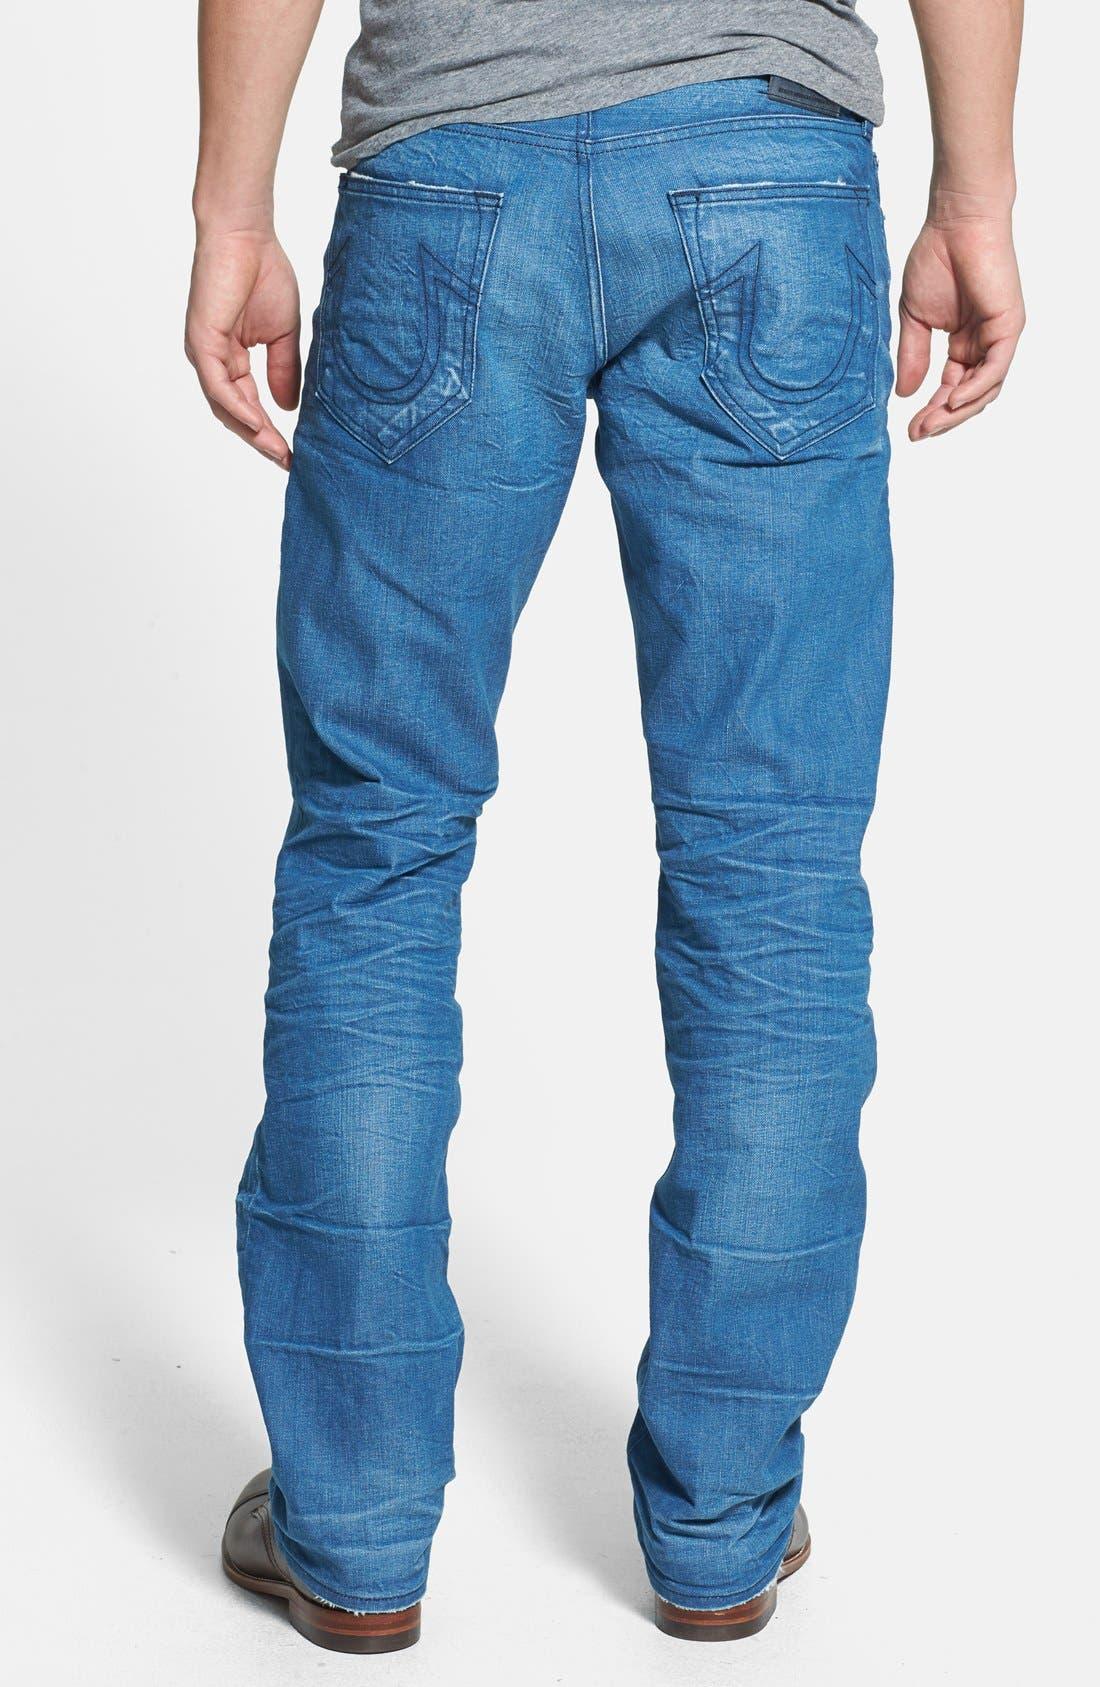 Main Image - True Religion Brand Jeans 'Bobby' Straight Leg Jeans (Azql Blue Caps)